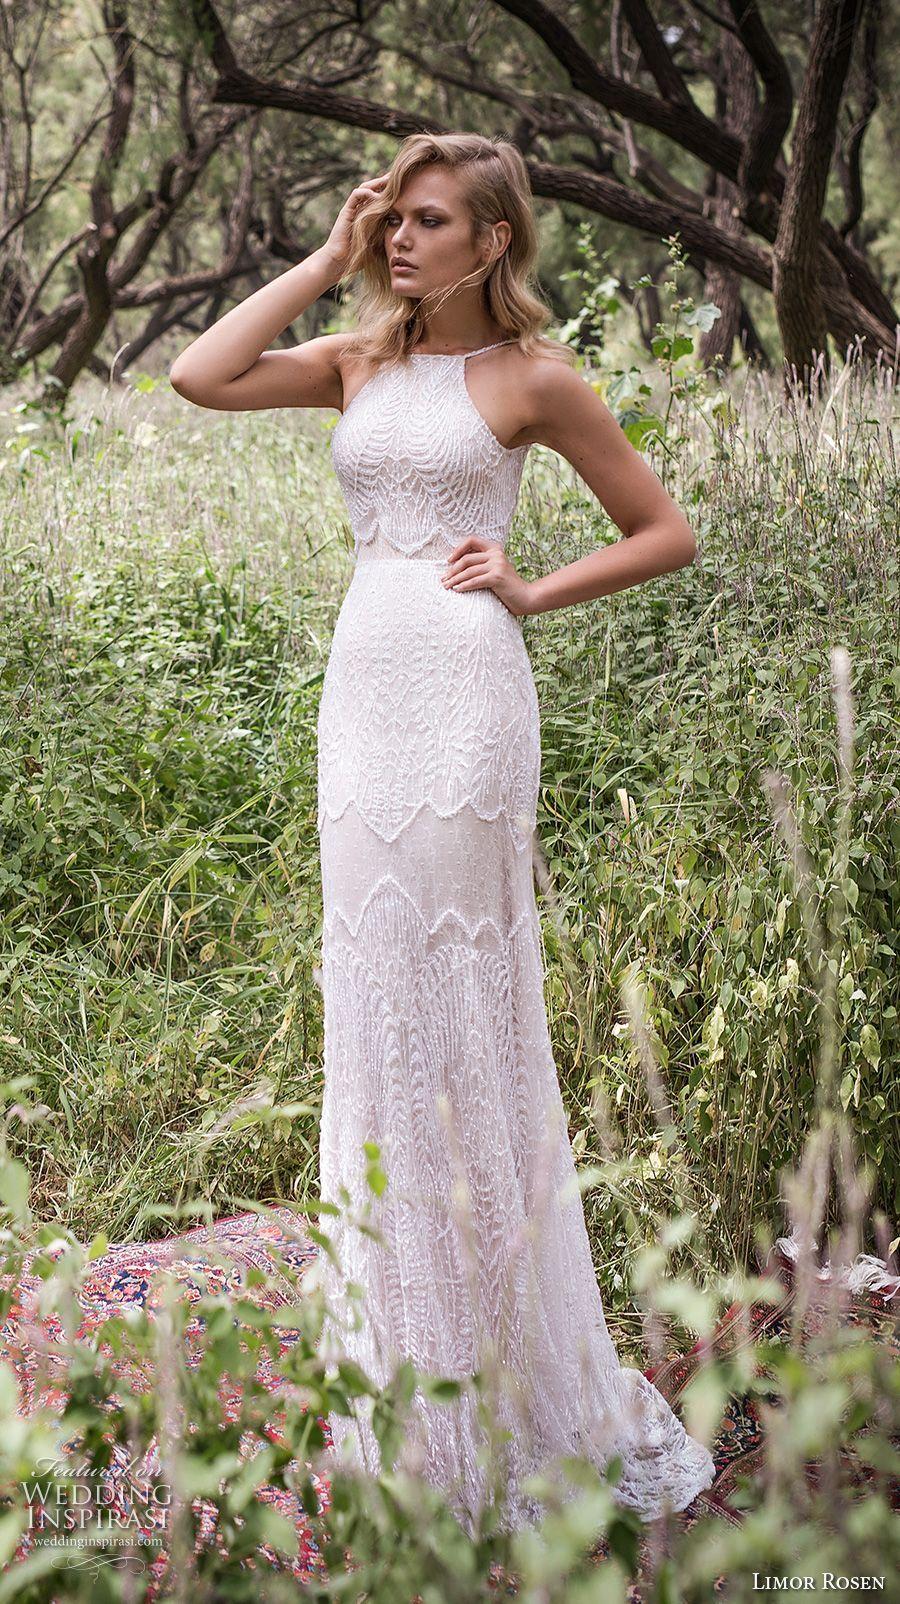 Limor Rosen's 2017 bridal collection presents the Tel Aviv based designer's most romantic wedding dress designs yet.